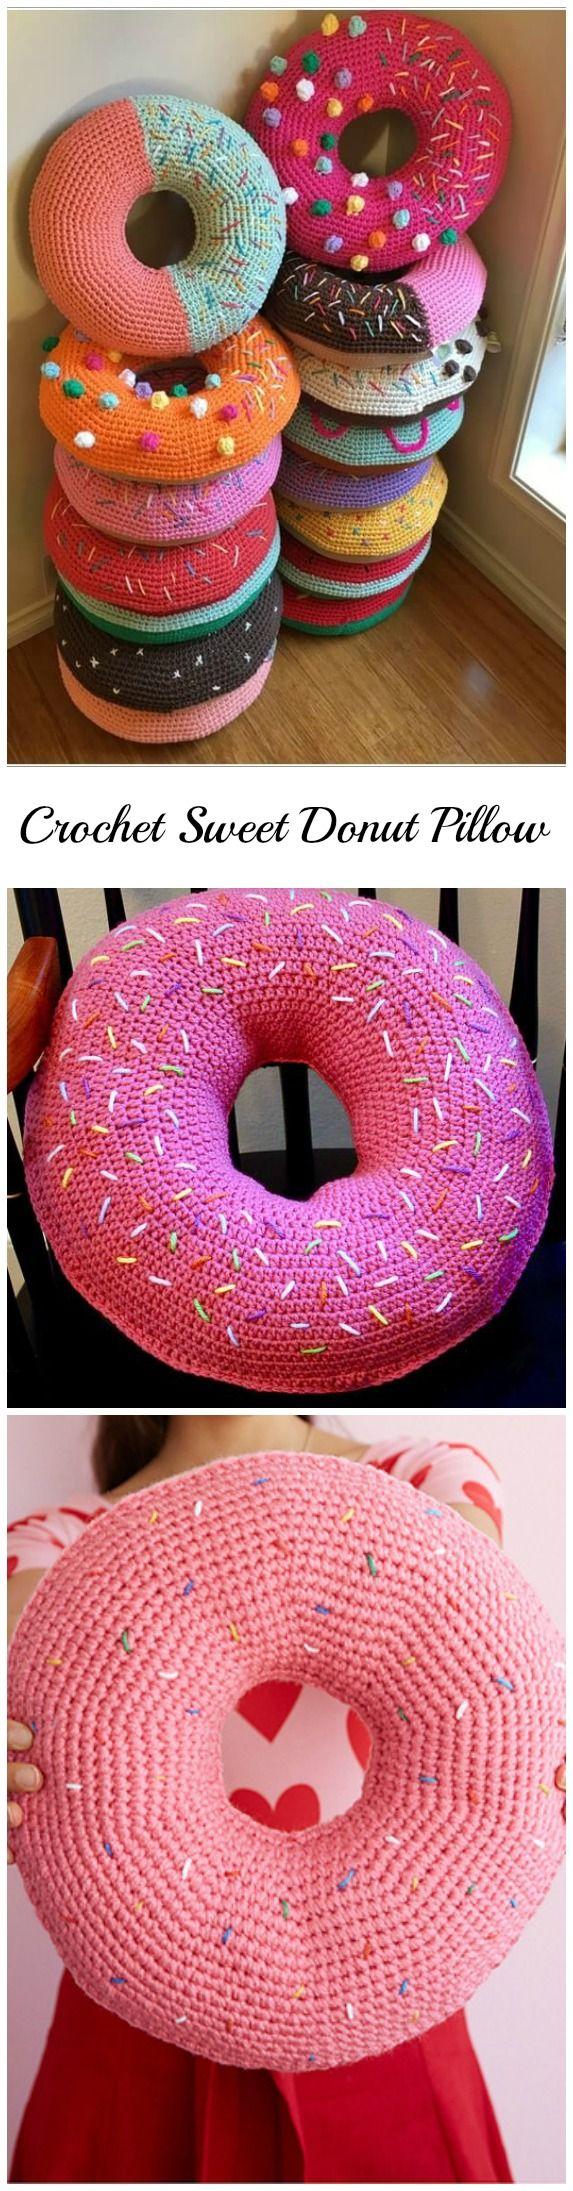 Almohada de dulce de rosquilla de ganchillo